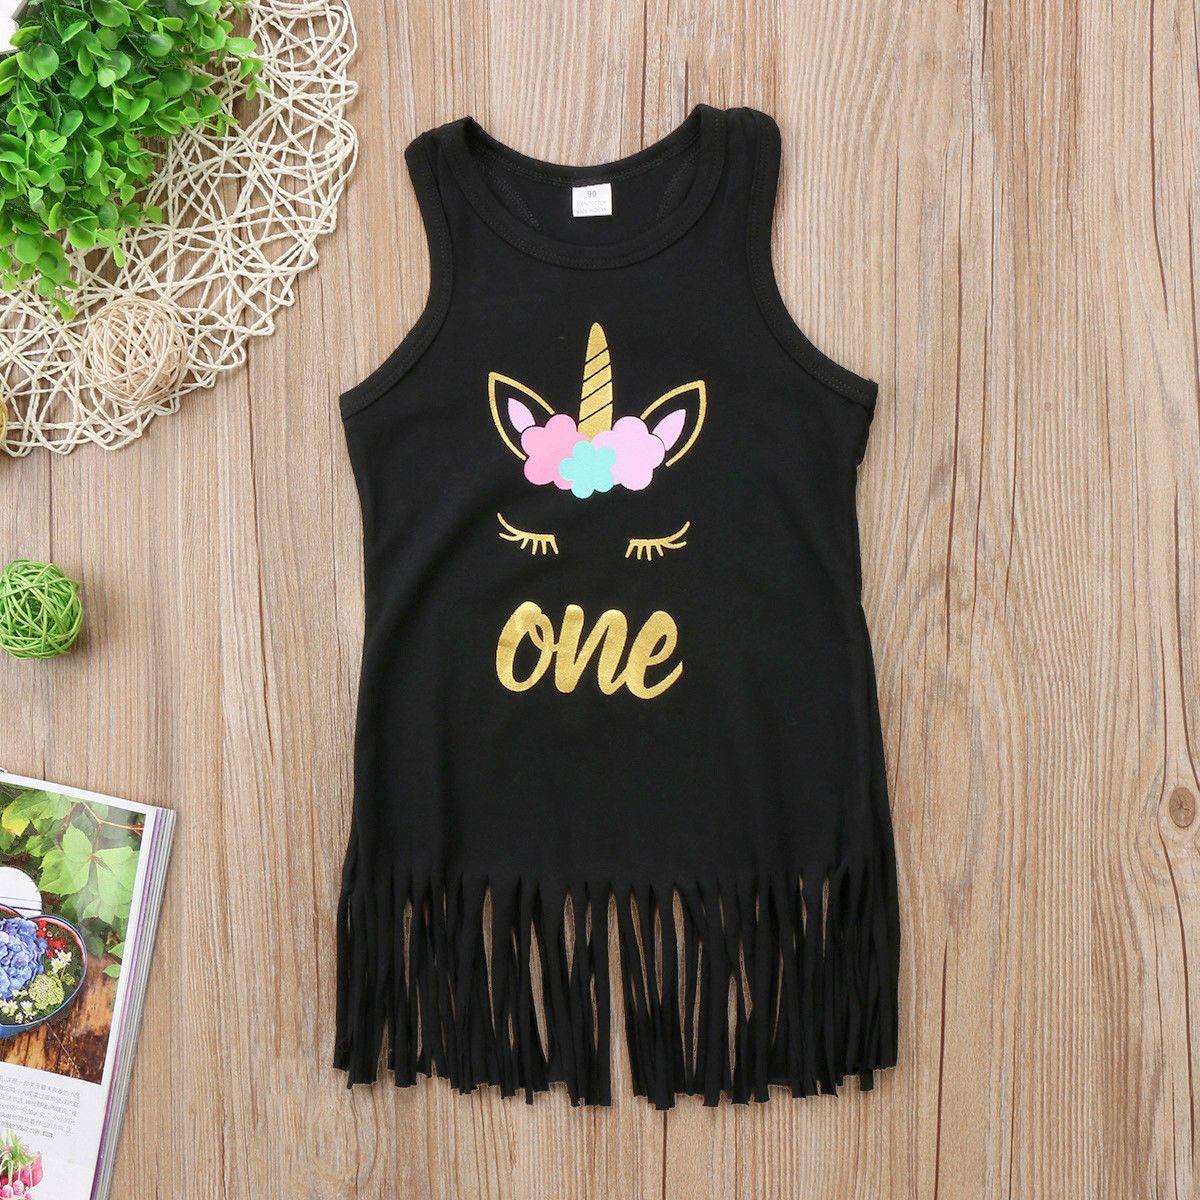 6079a5ad1 2019 2018 Summer Baby Girls Tassel Unicorn Sleeveless Black Dresses ...